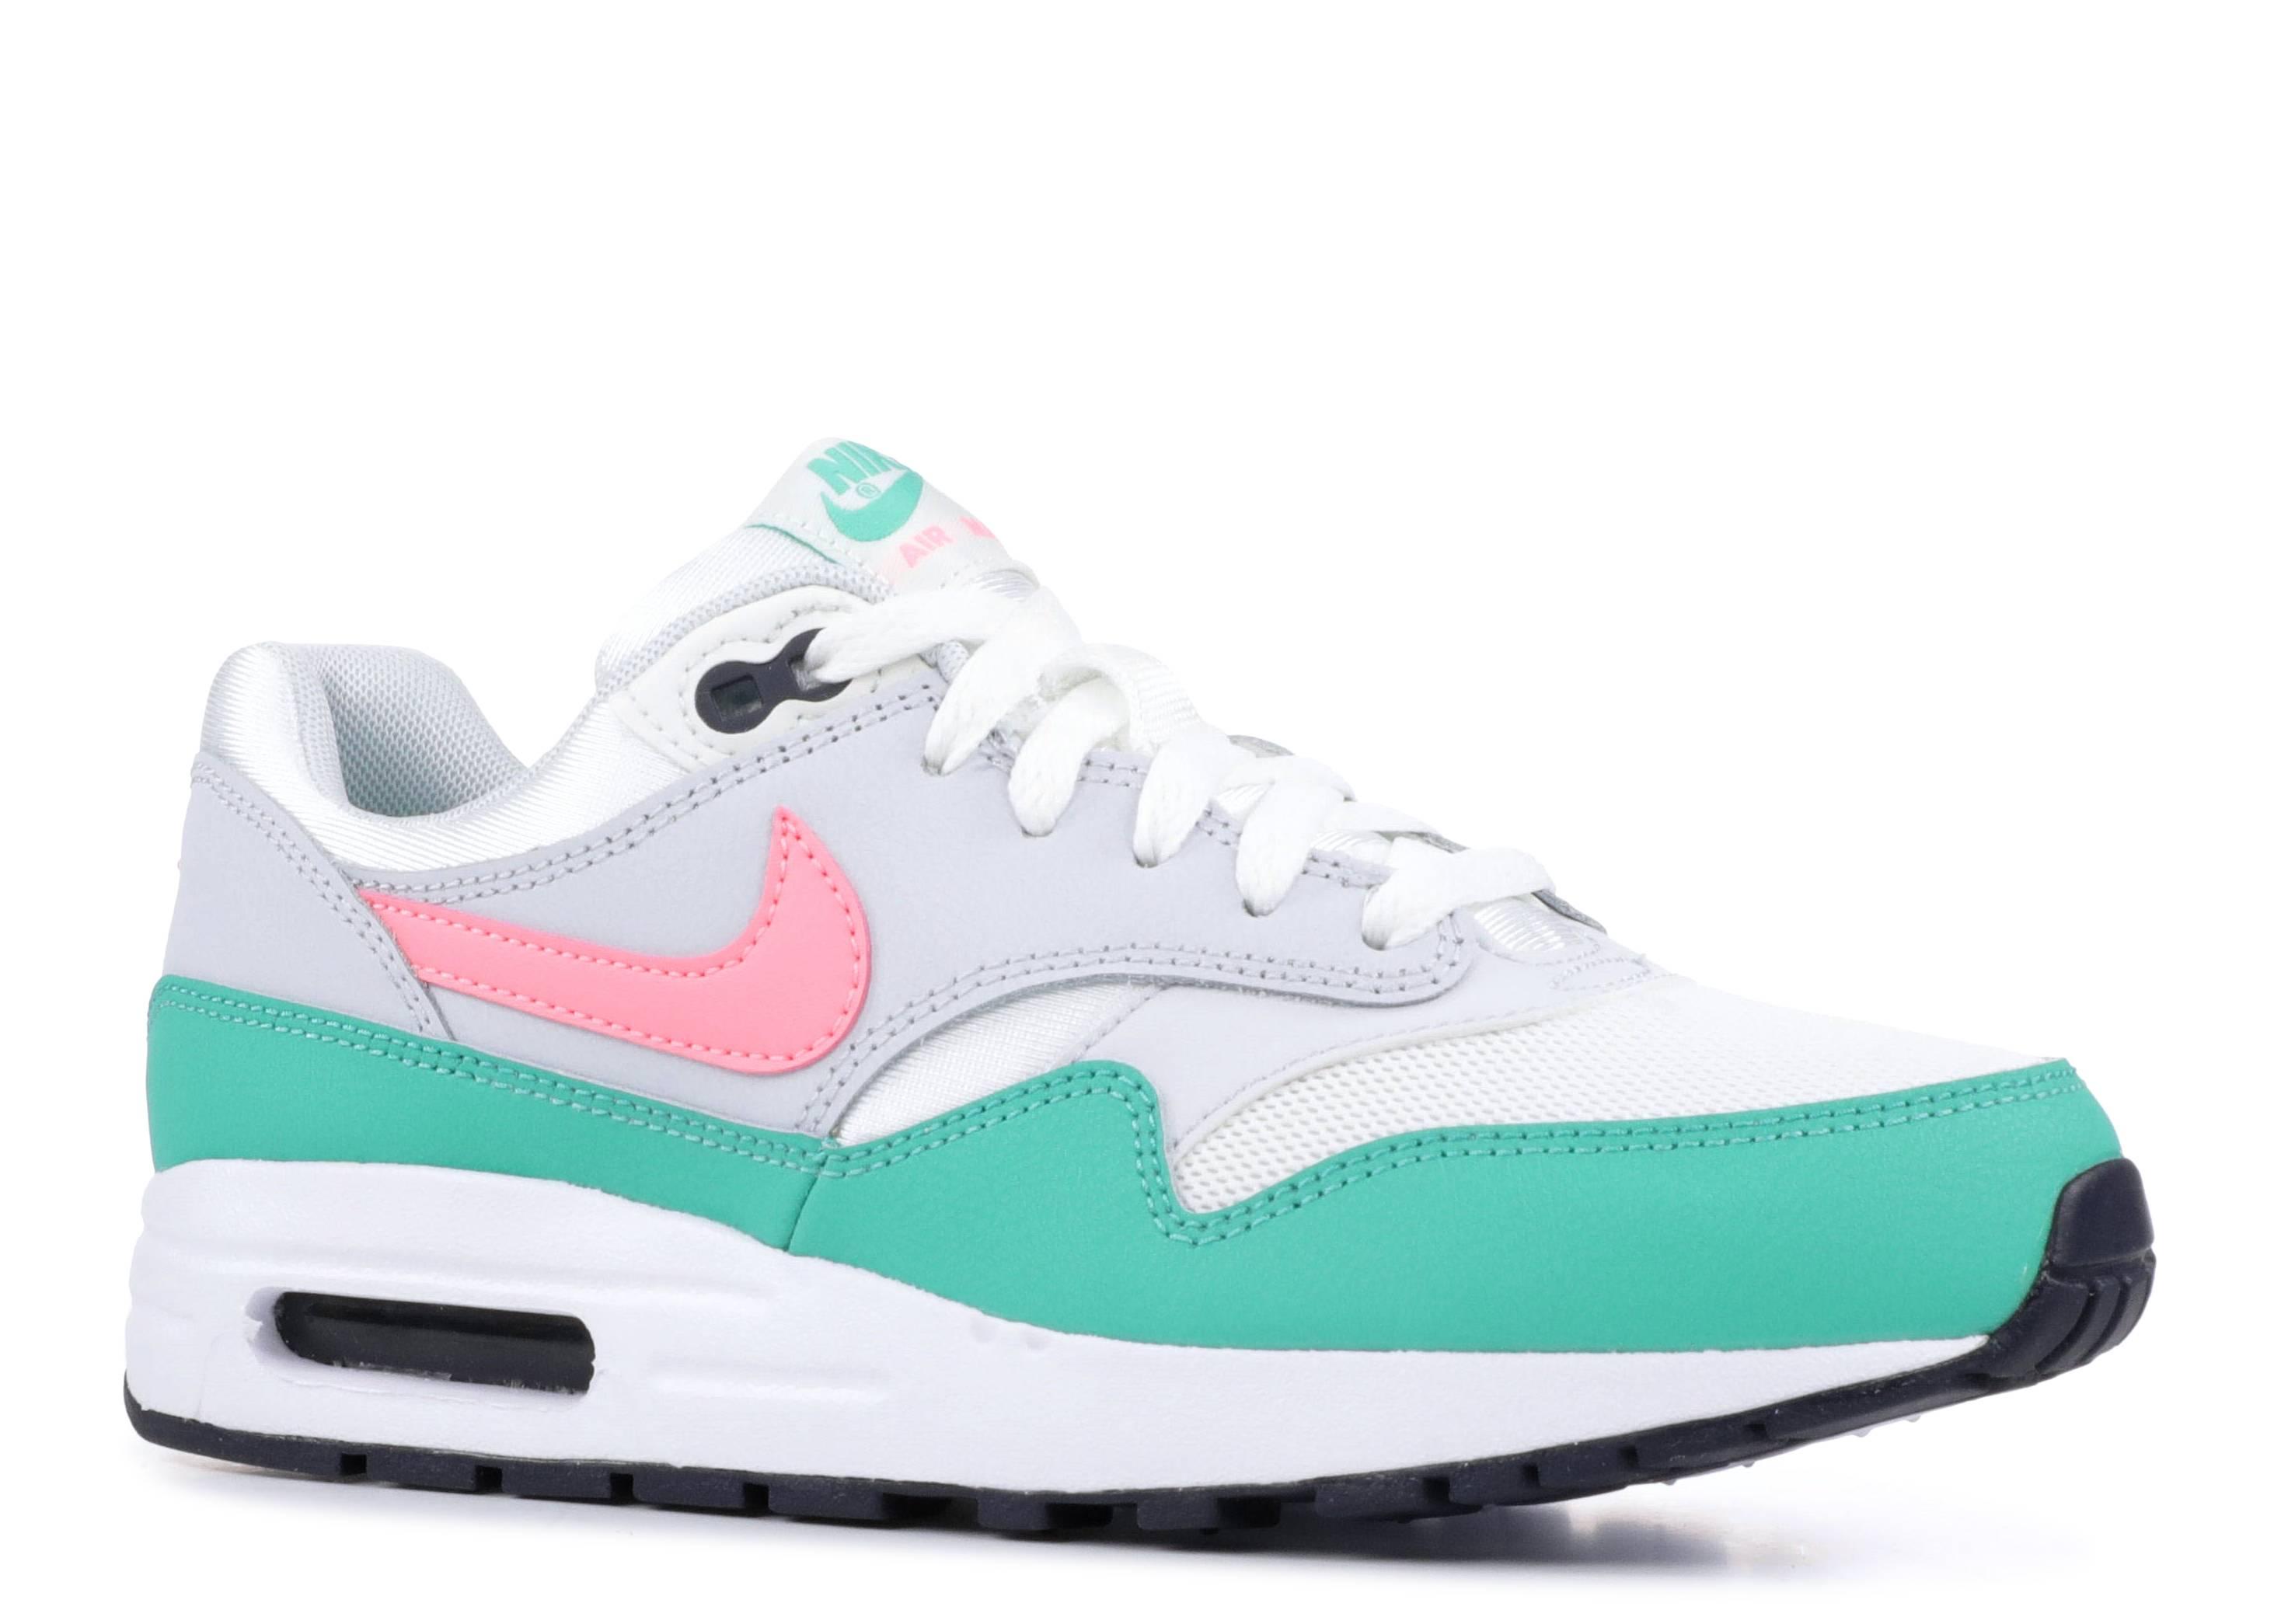 Nike Air Max 1 Green Watermelon Pink Women Zoom Running